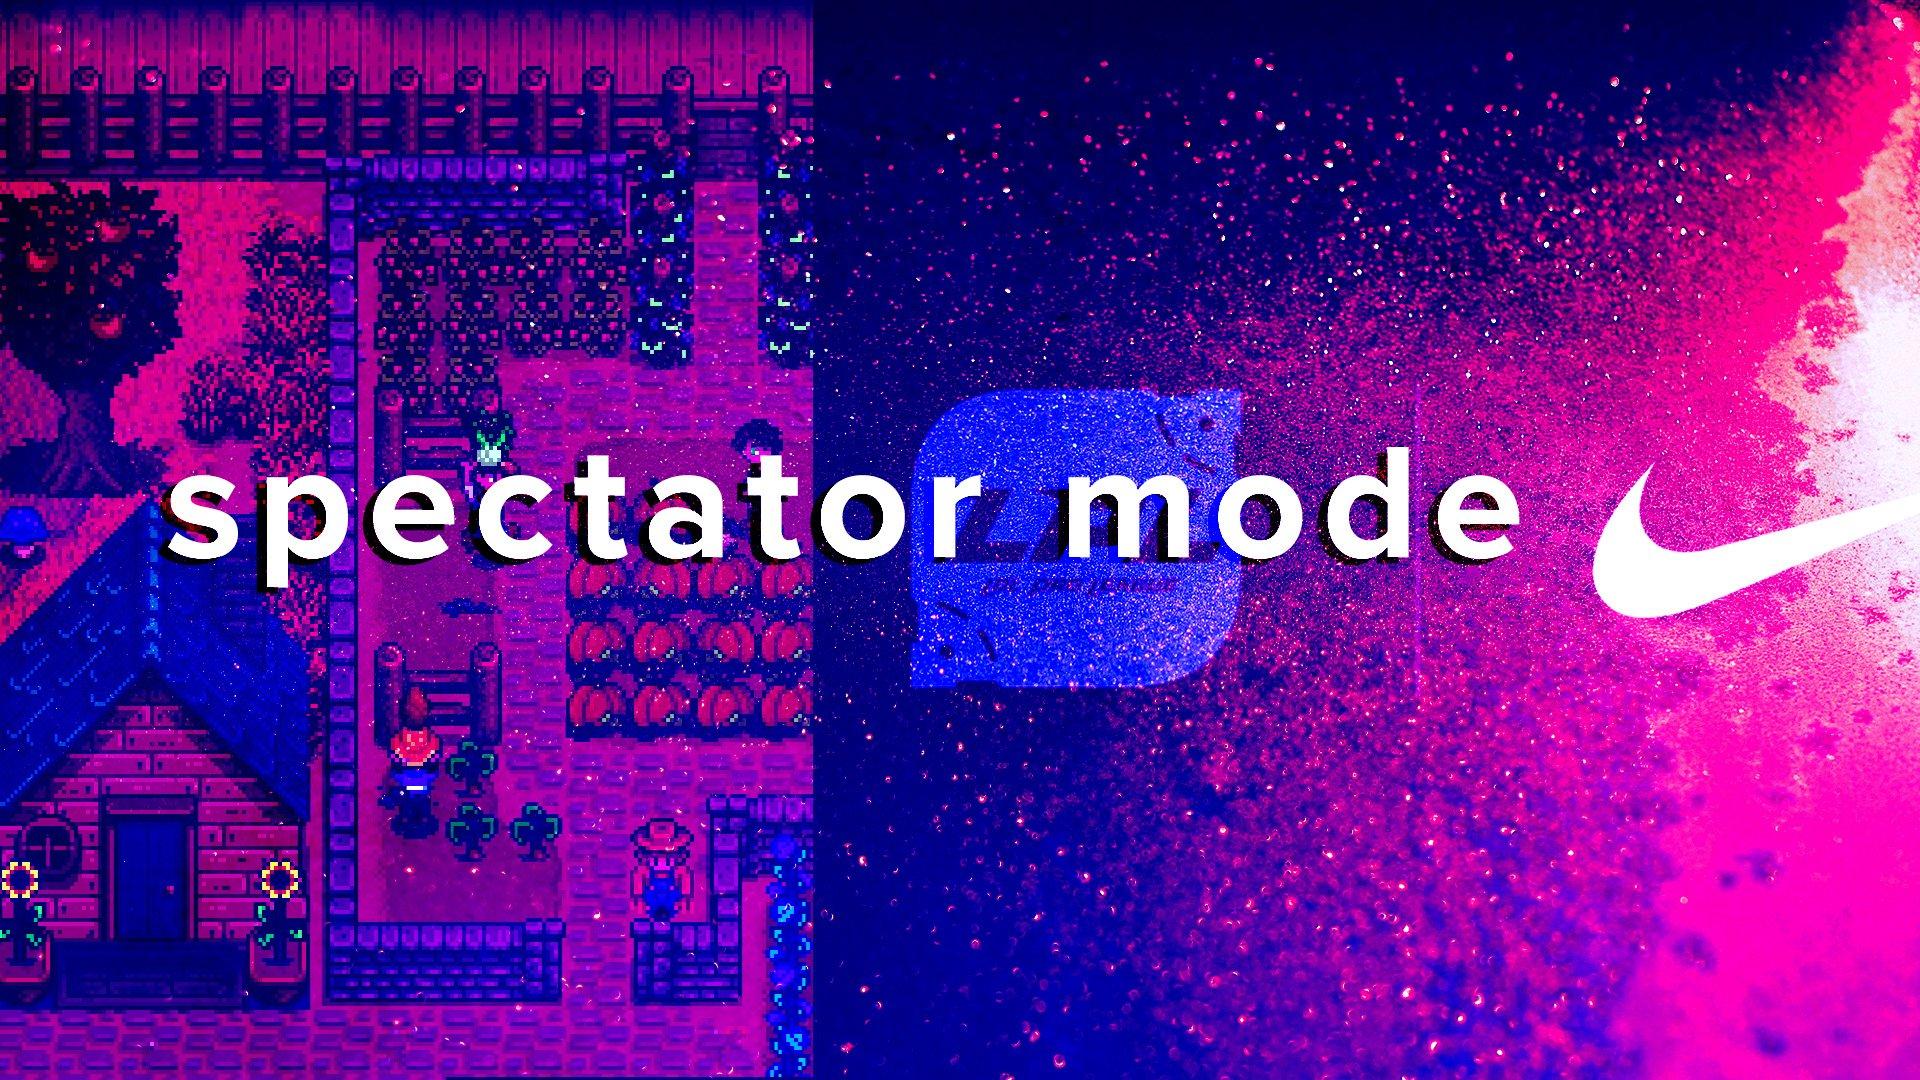 Spectator Mode: Stardew Valley, Overwatch League viewership